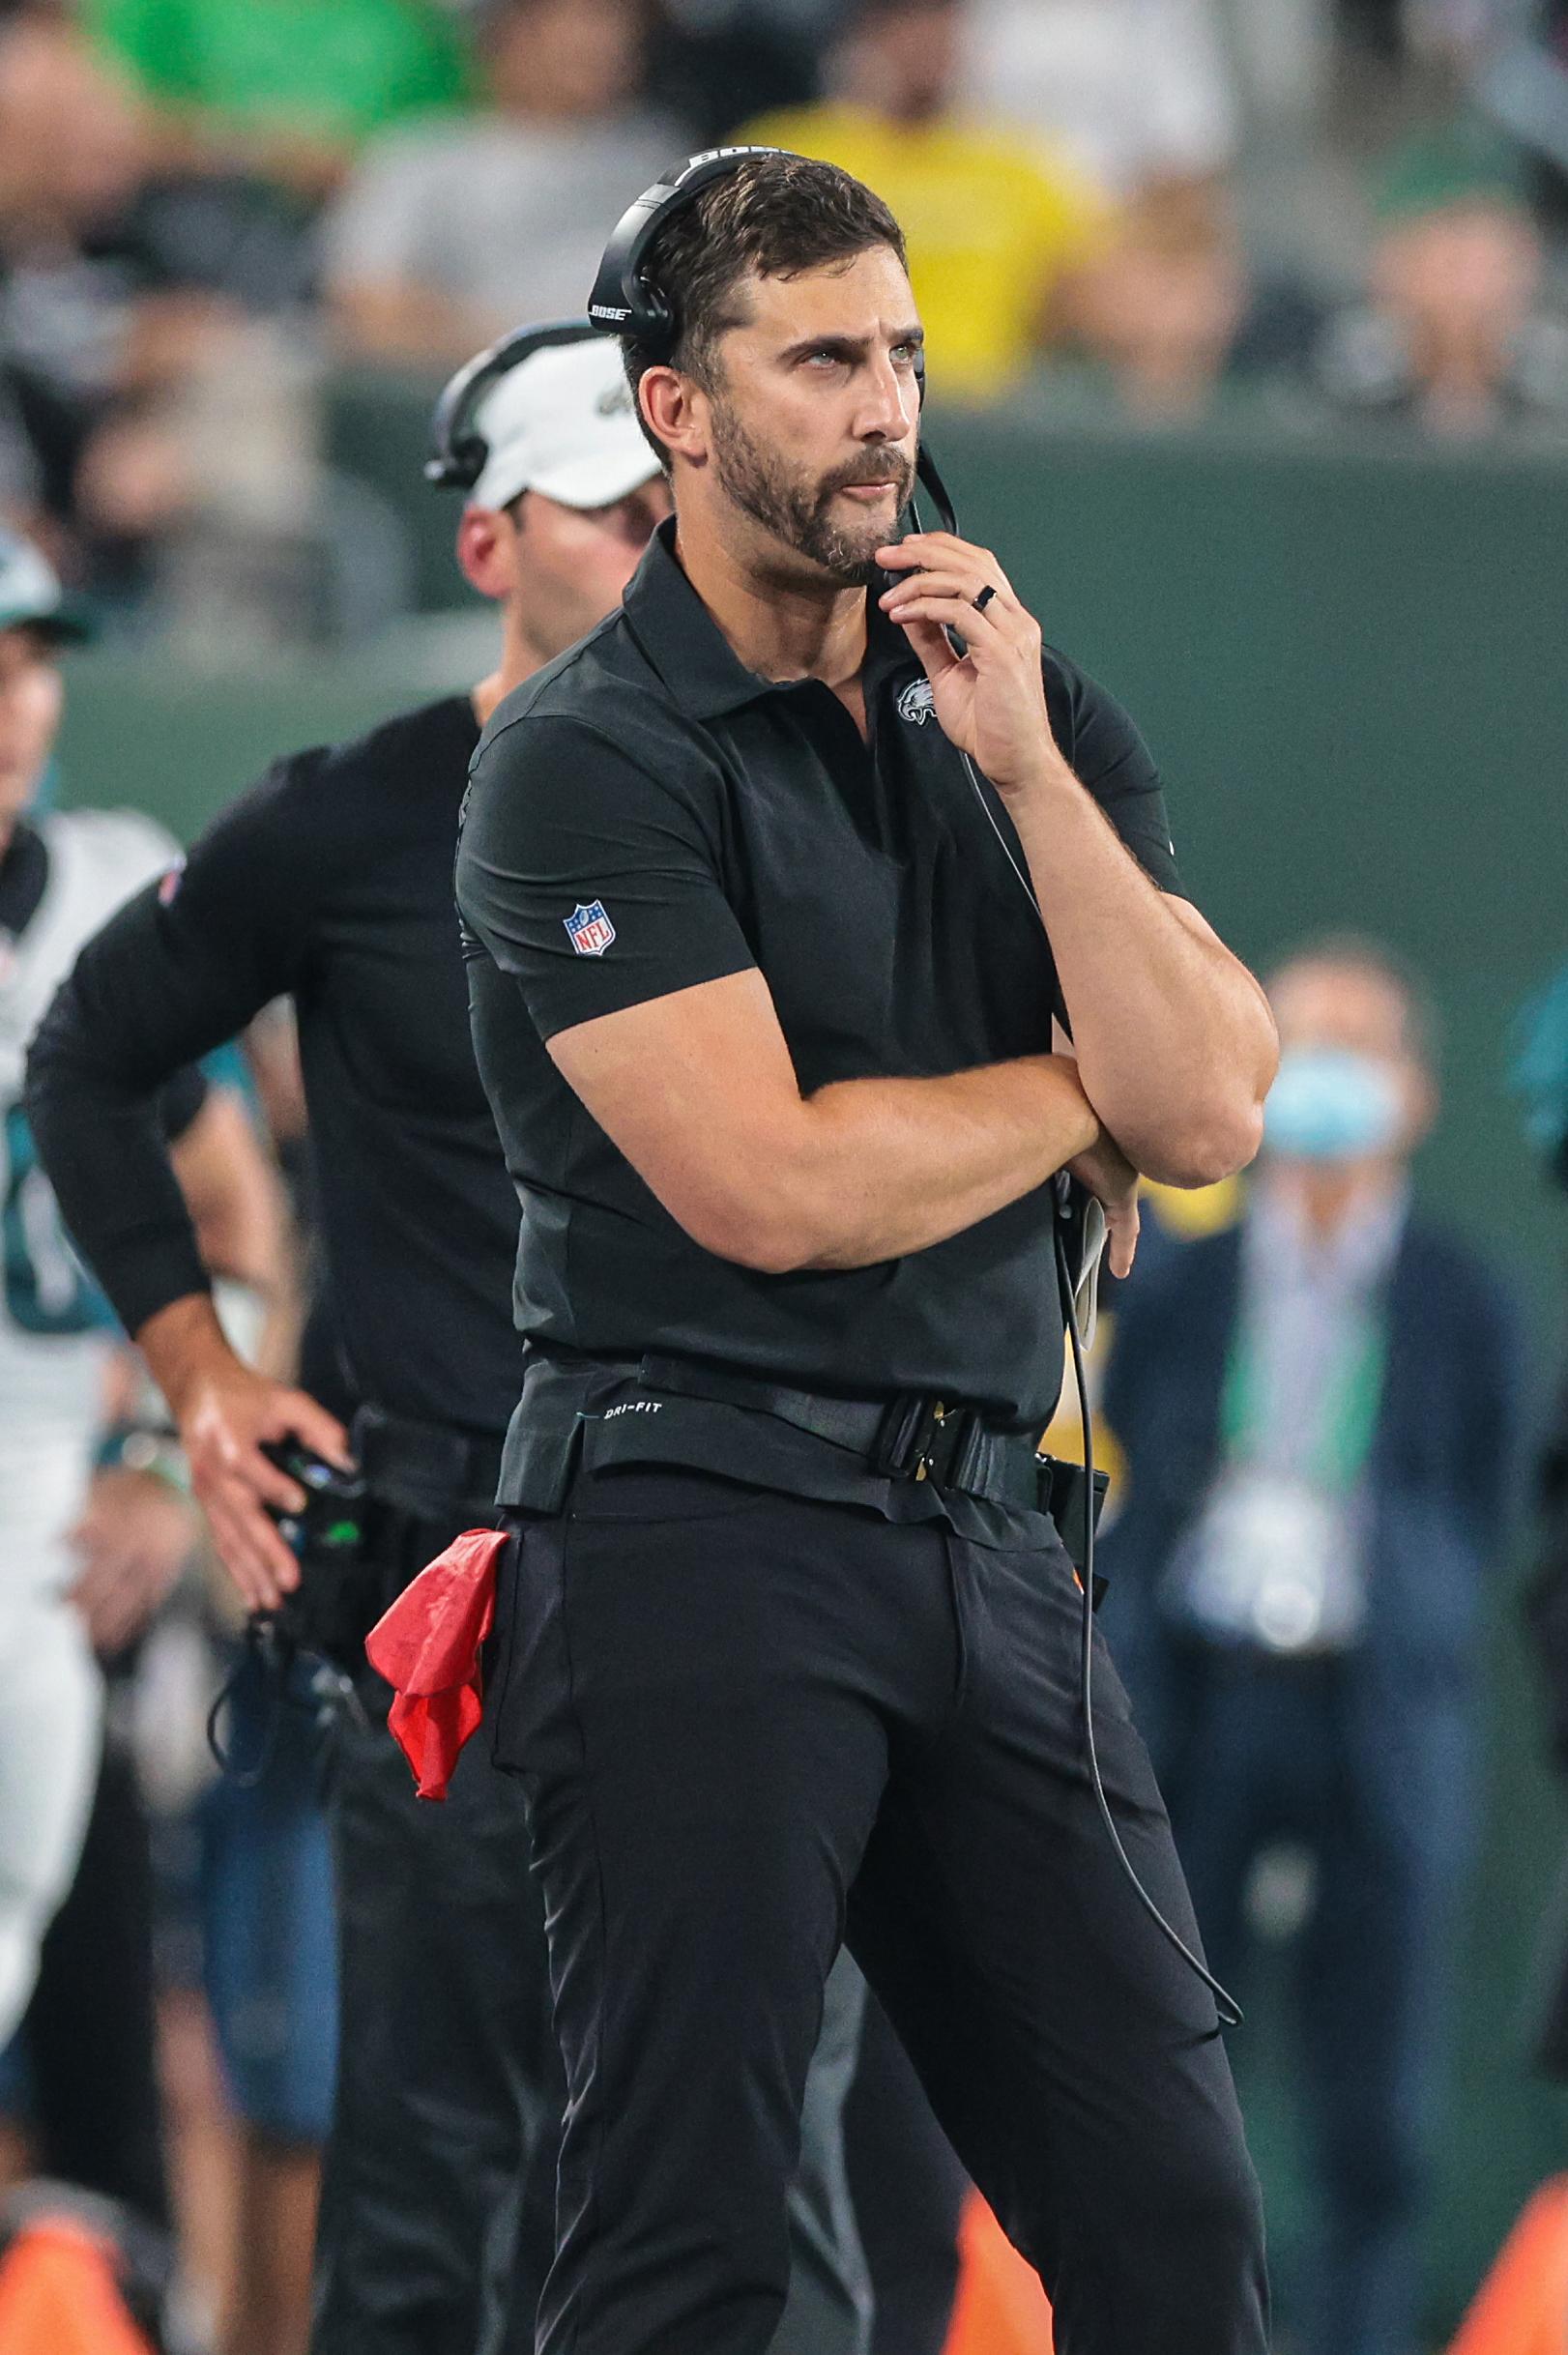 NFL: Philadelphia Eagles at New York Jets